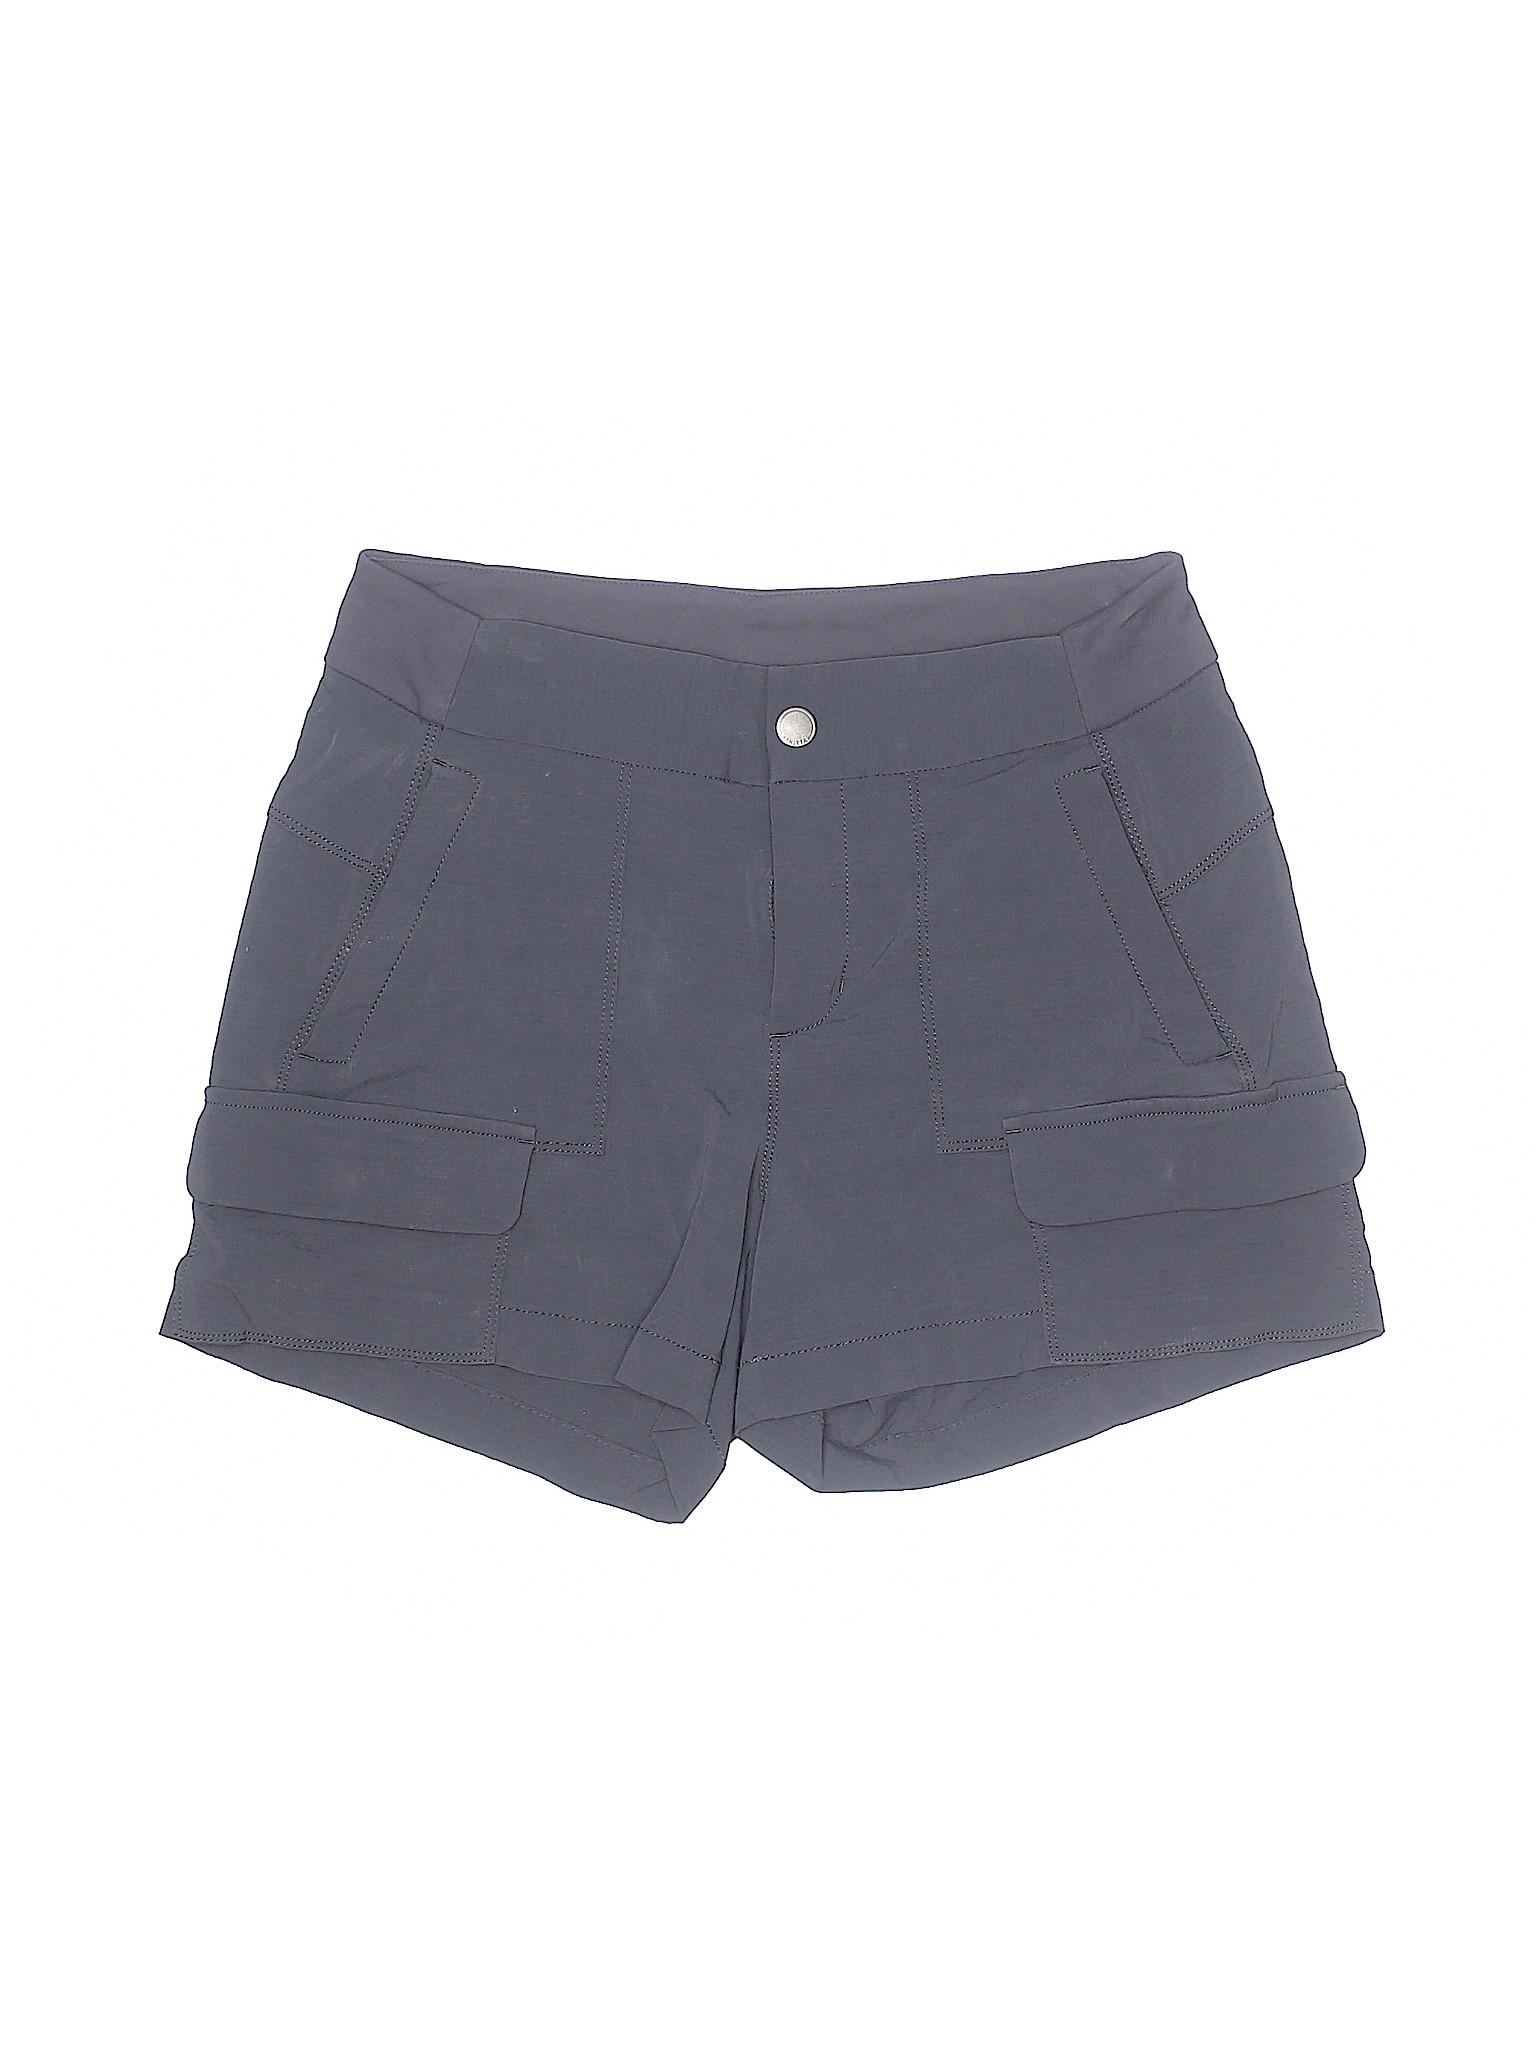 Boutique Athletic Shorts Shorts Athleta Athletic Boutique Athleta FSFarq